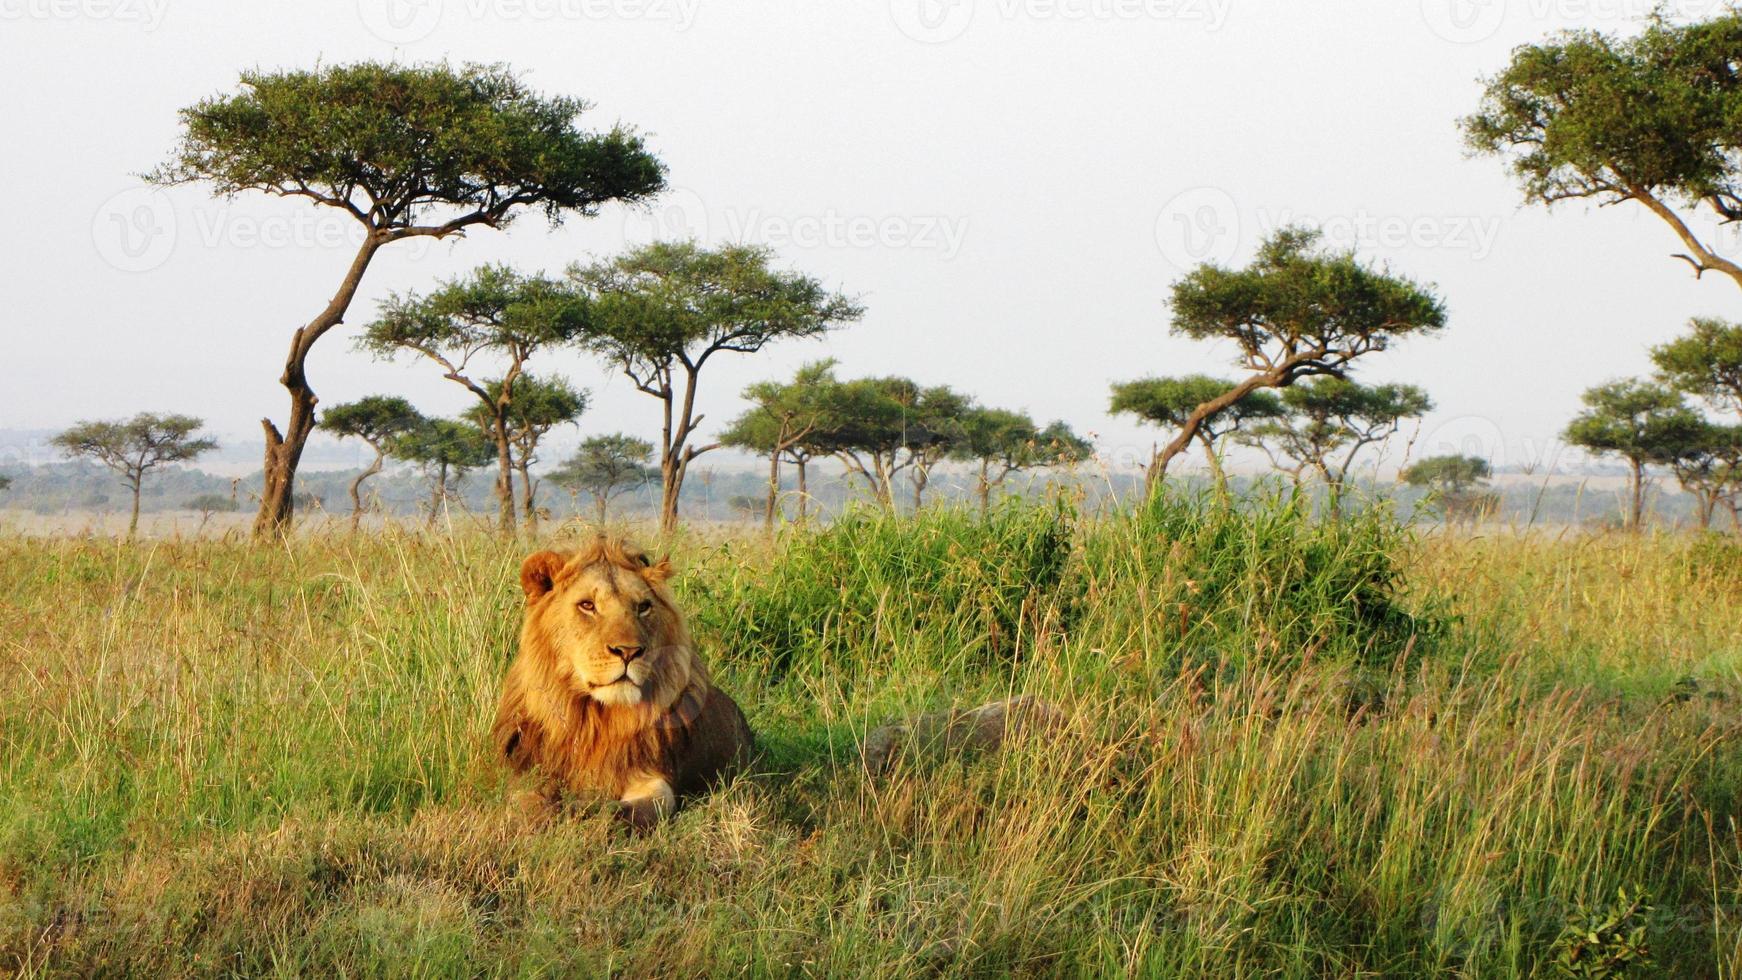 Löwe - Savanne, Masai Mara National Reserve, Kenia foto